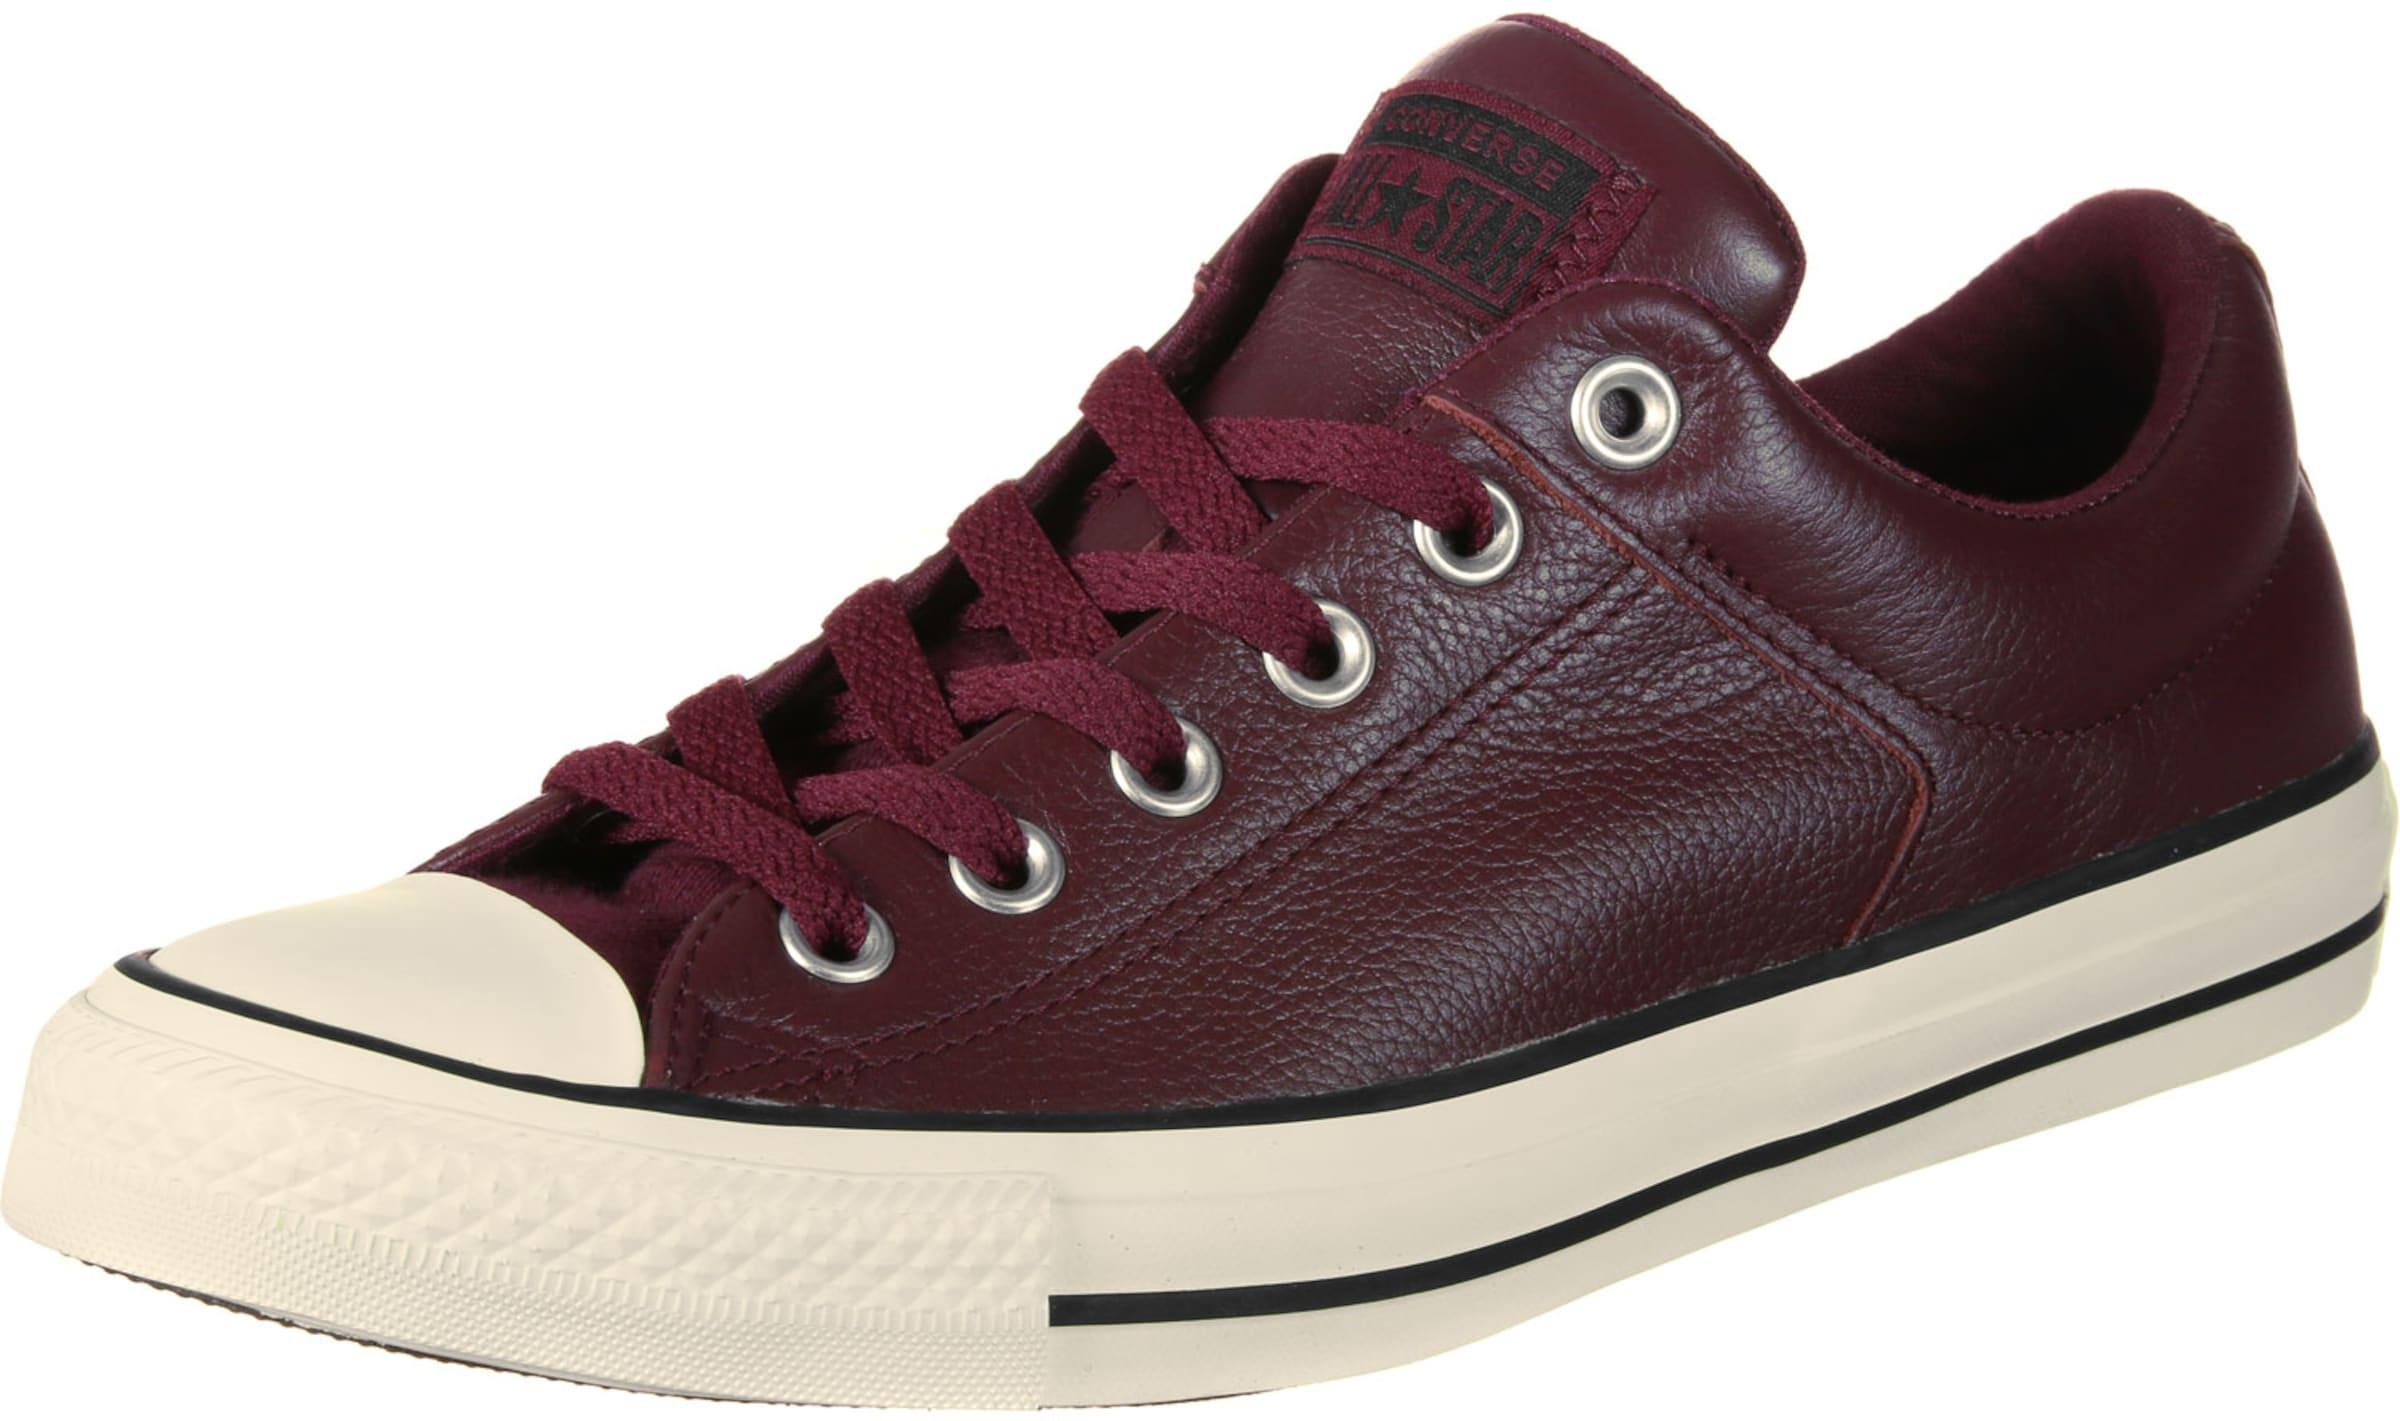 Street BurgunderPerlweiß High Converse Star Sneaker Ox' 'all In b6Yfg7y